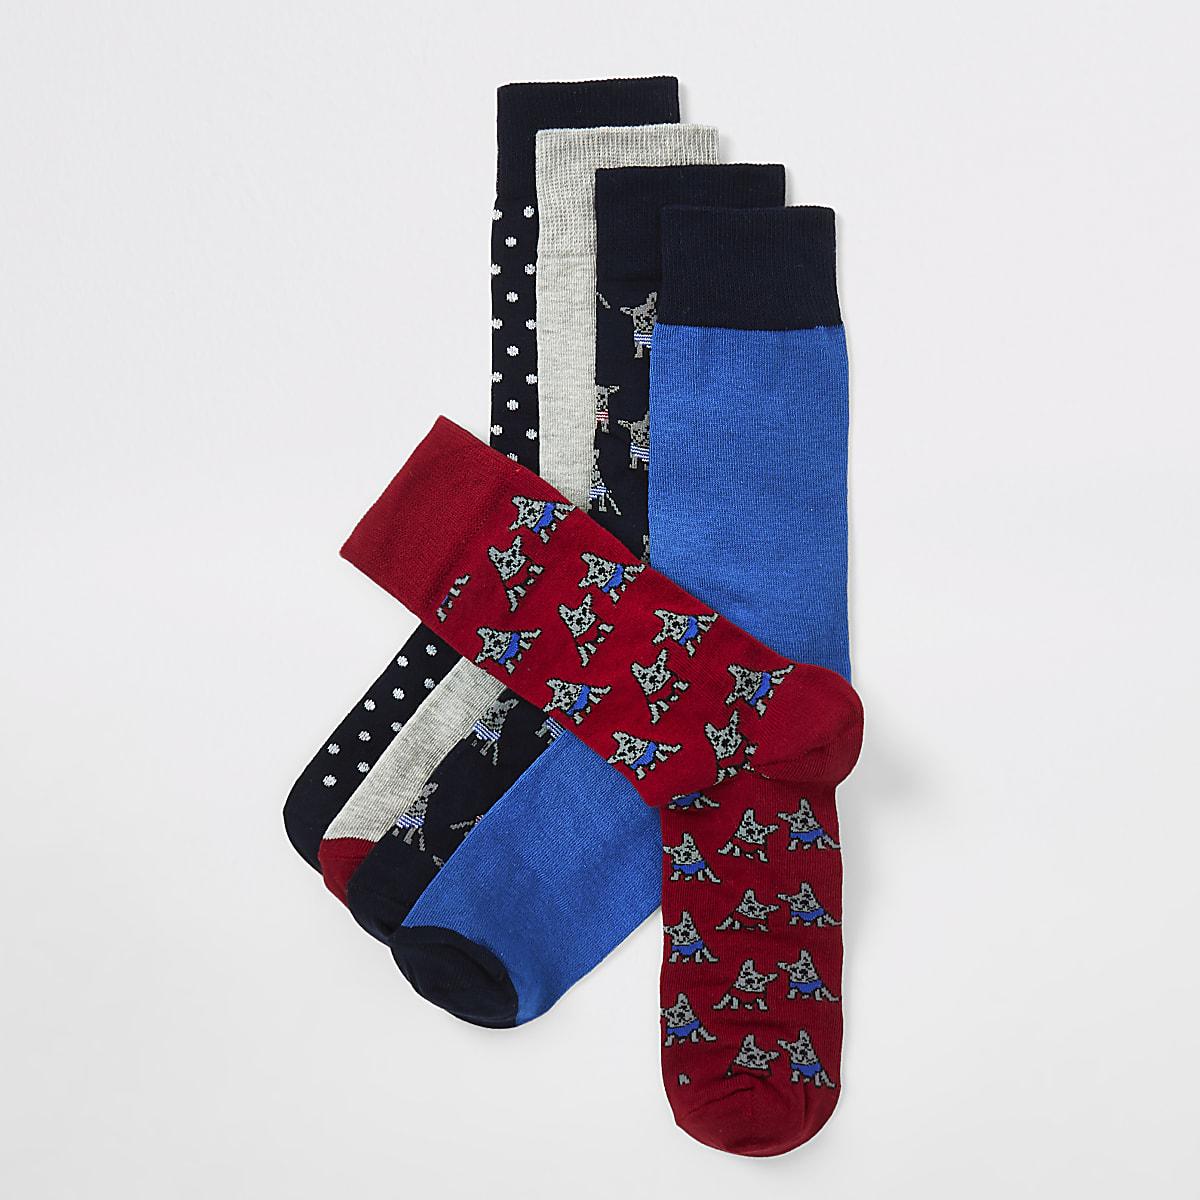 Navy dog print socks 5 pack